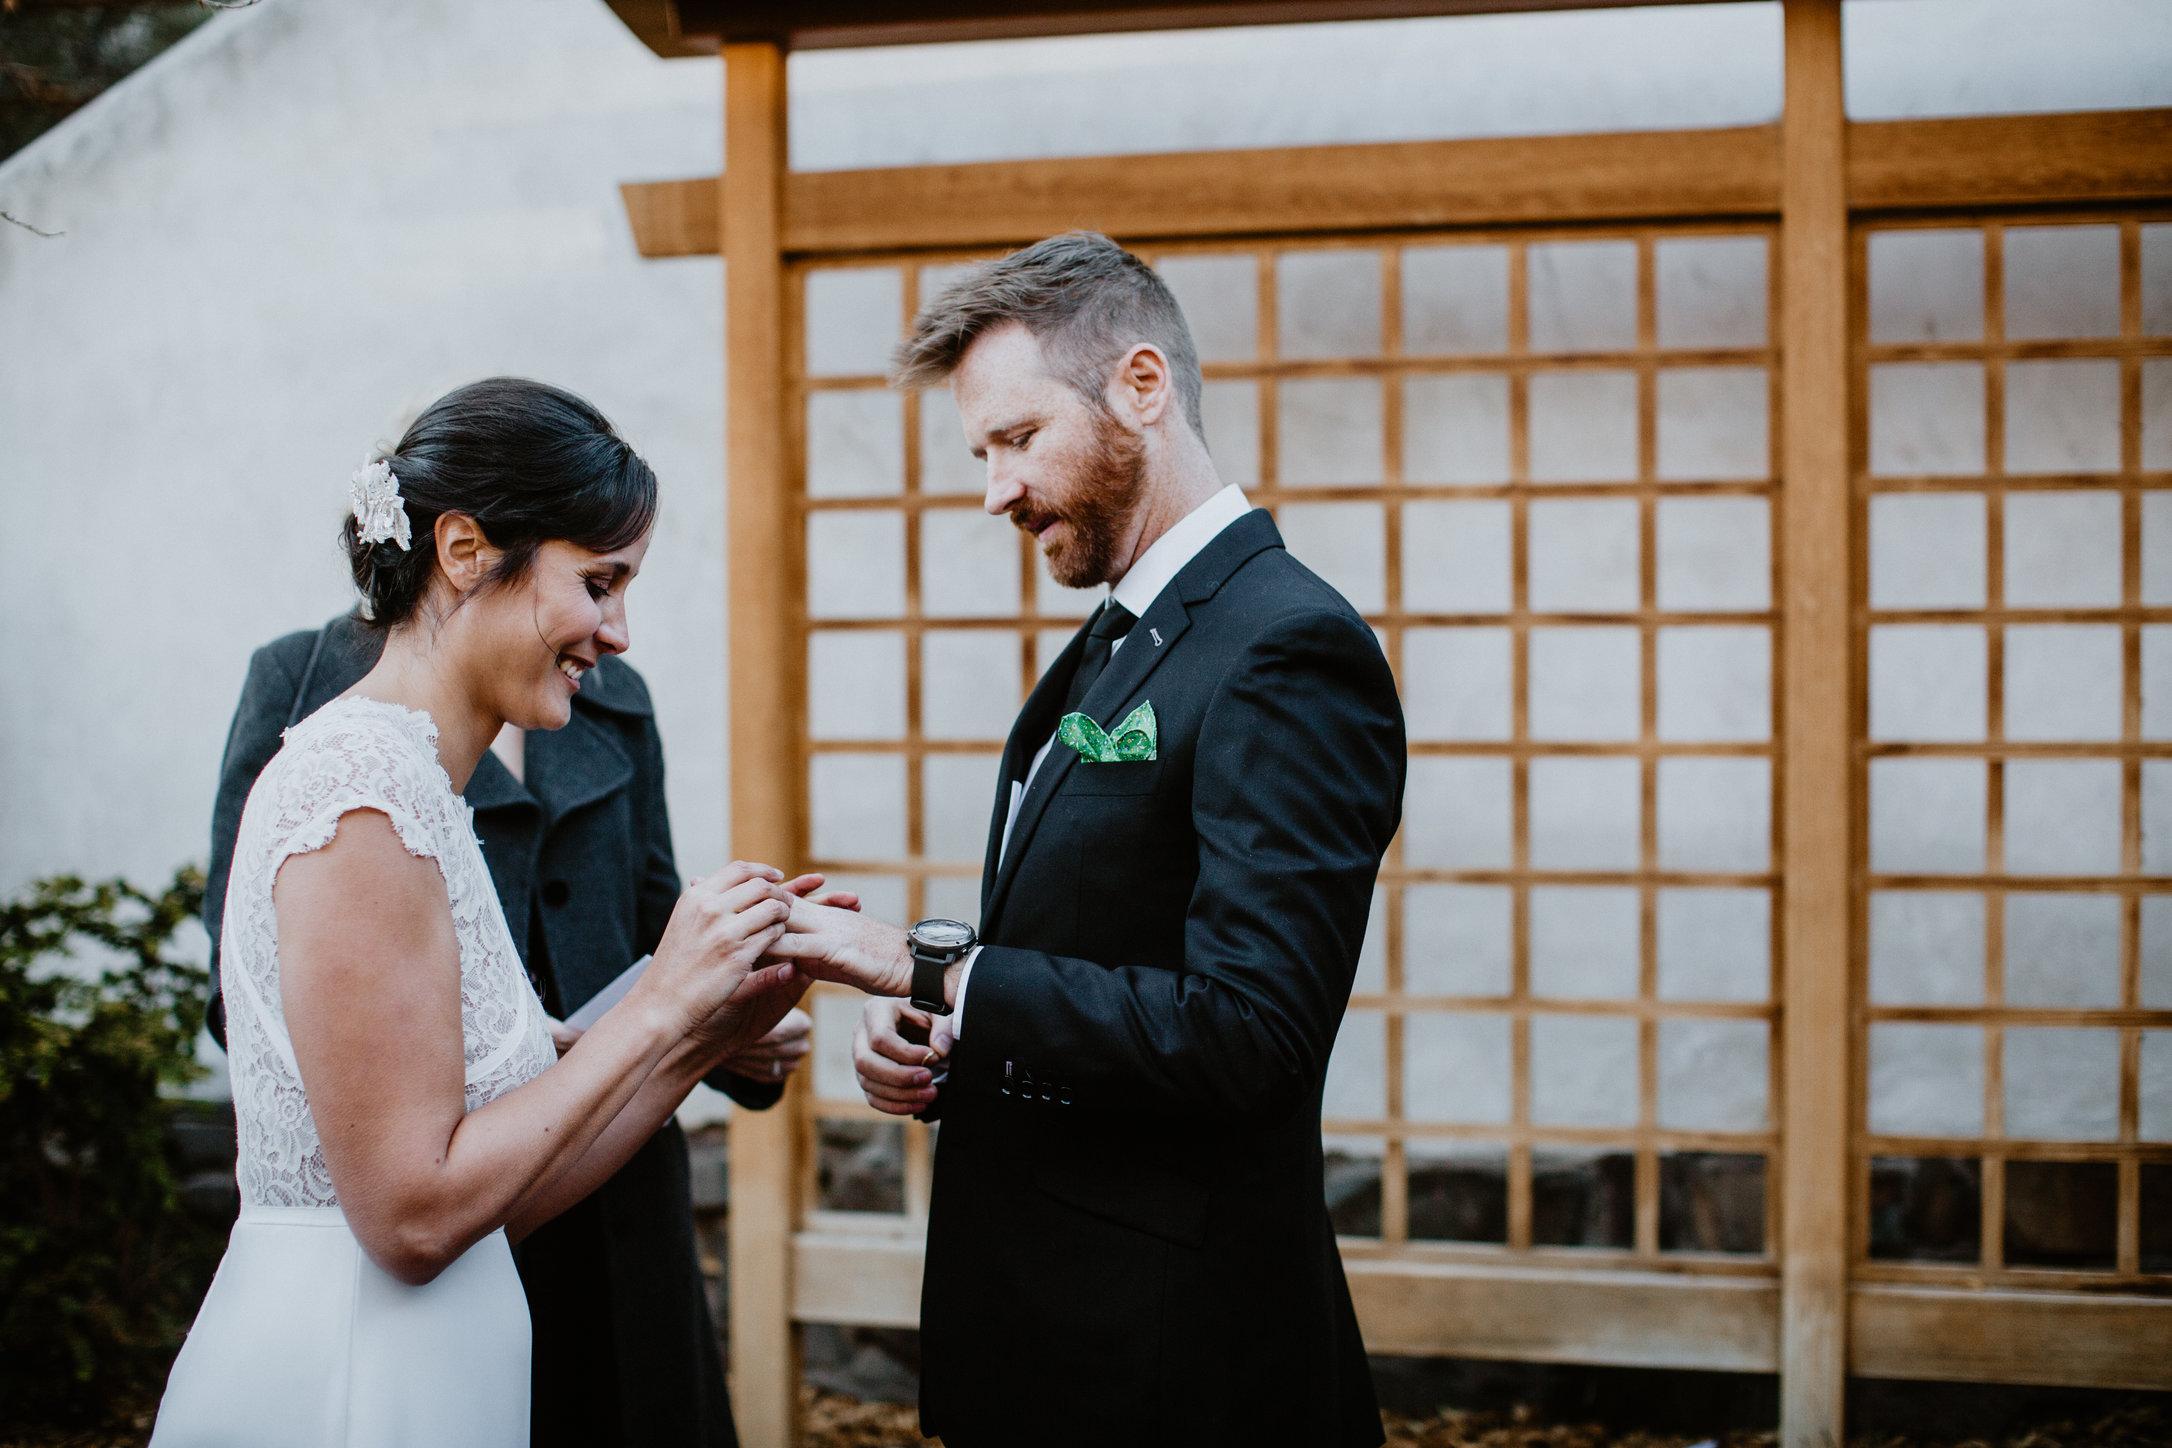 HandM-wedding-96.jpg